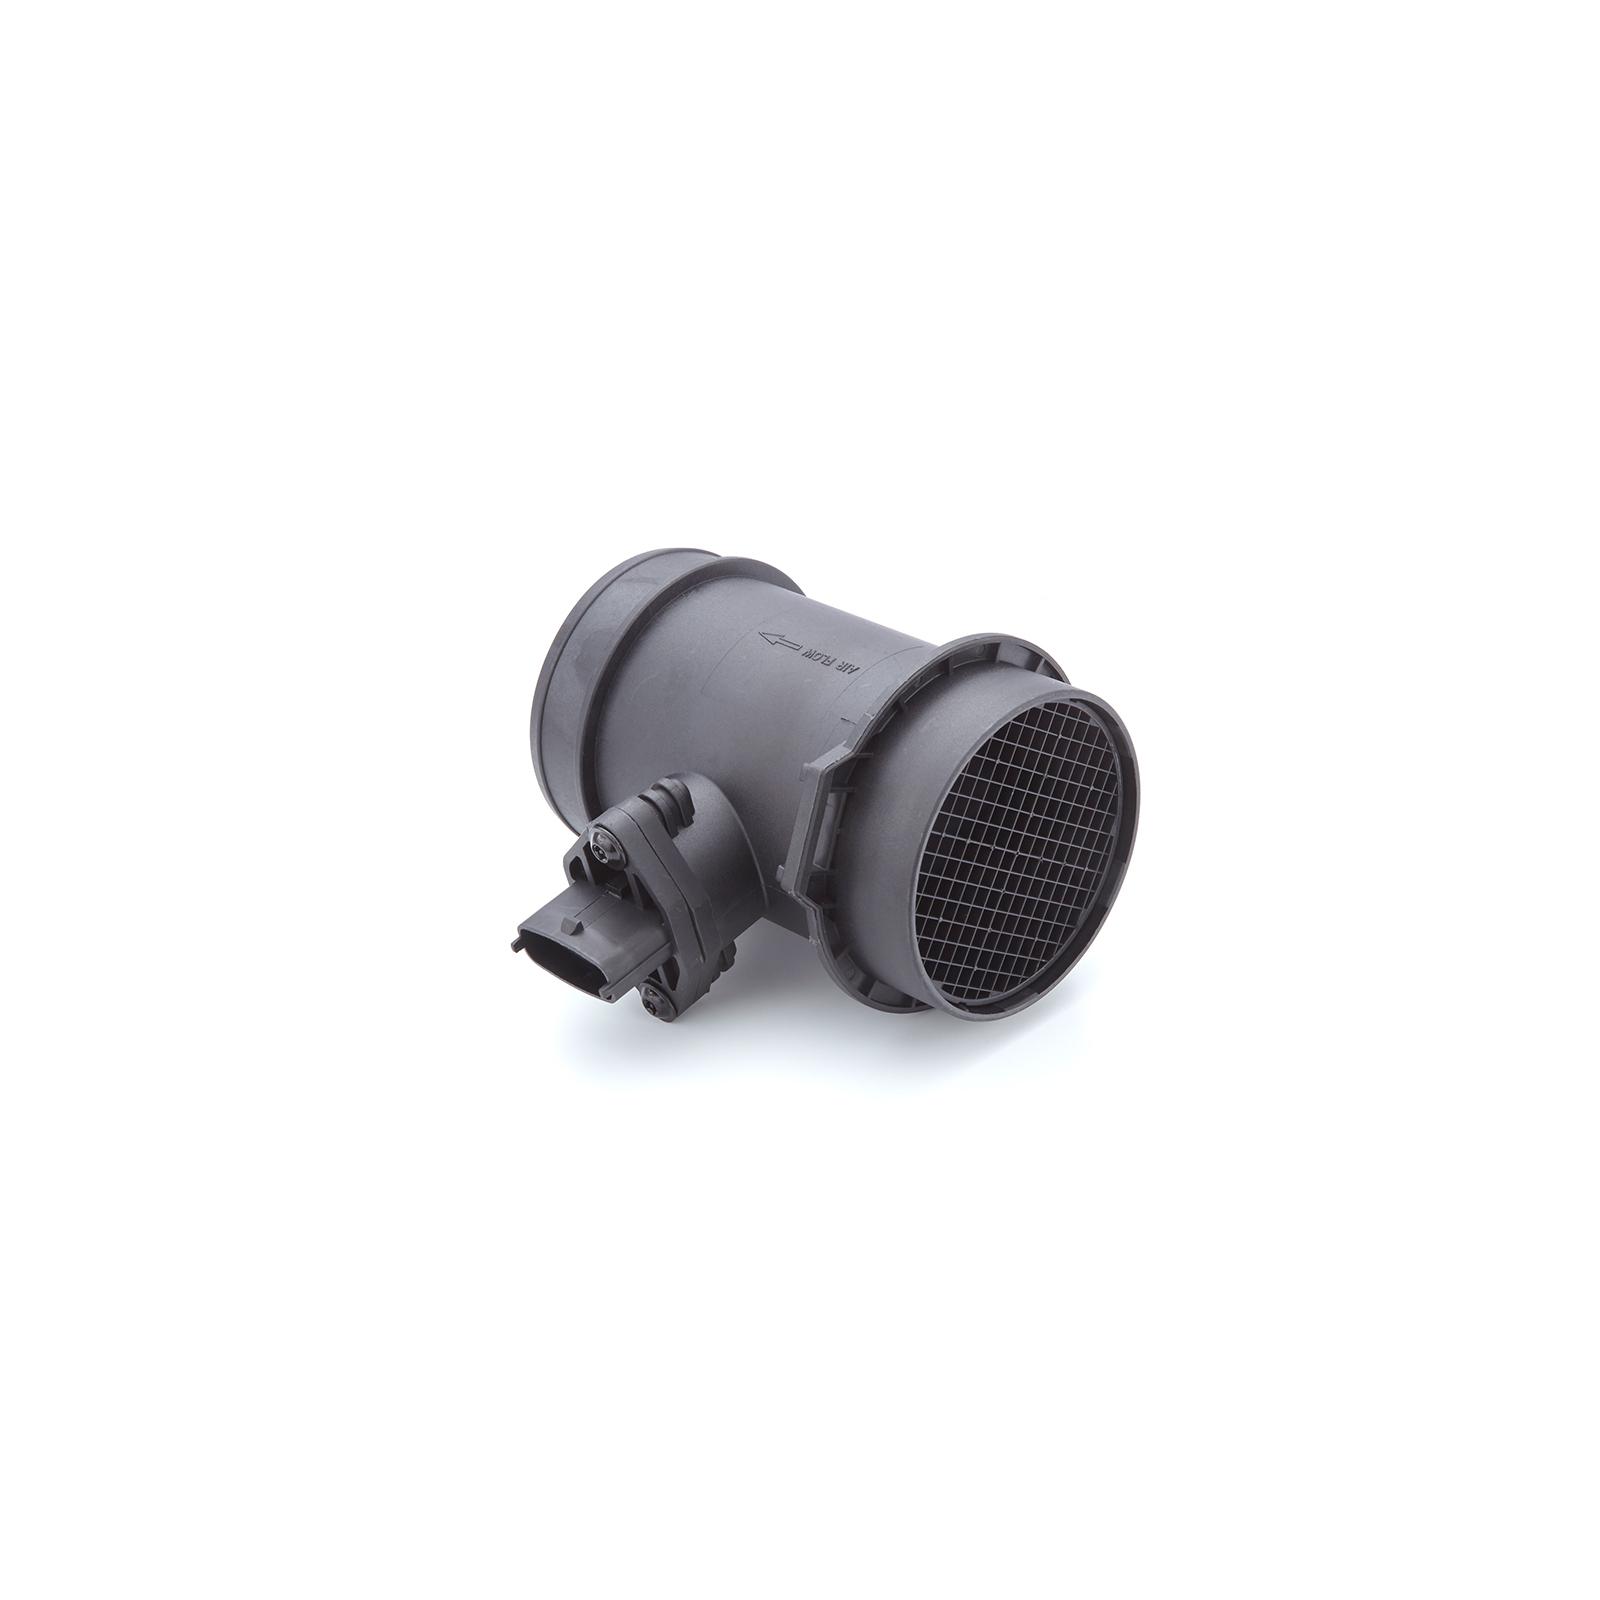 Mass-Air-Flow-Meter-Sensor-For-Honda-MG-Rover-Ferrari Indexbild 2